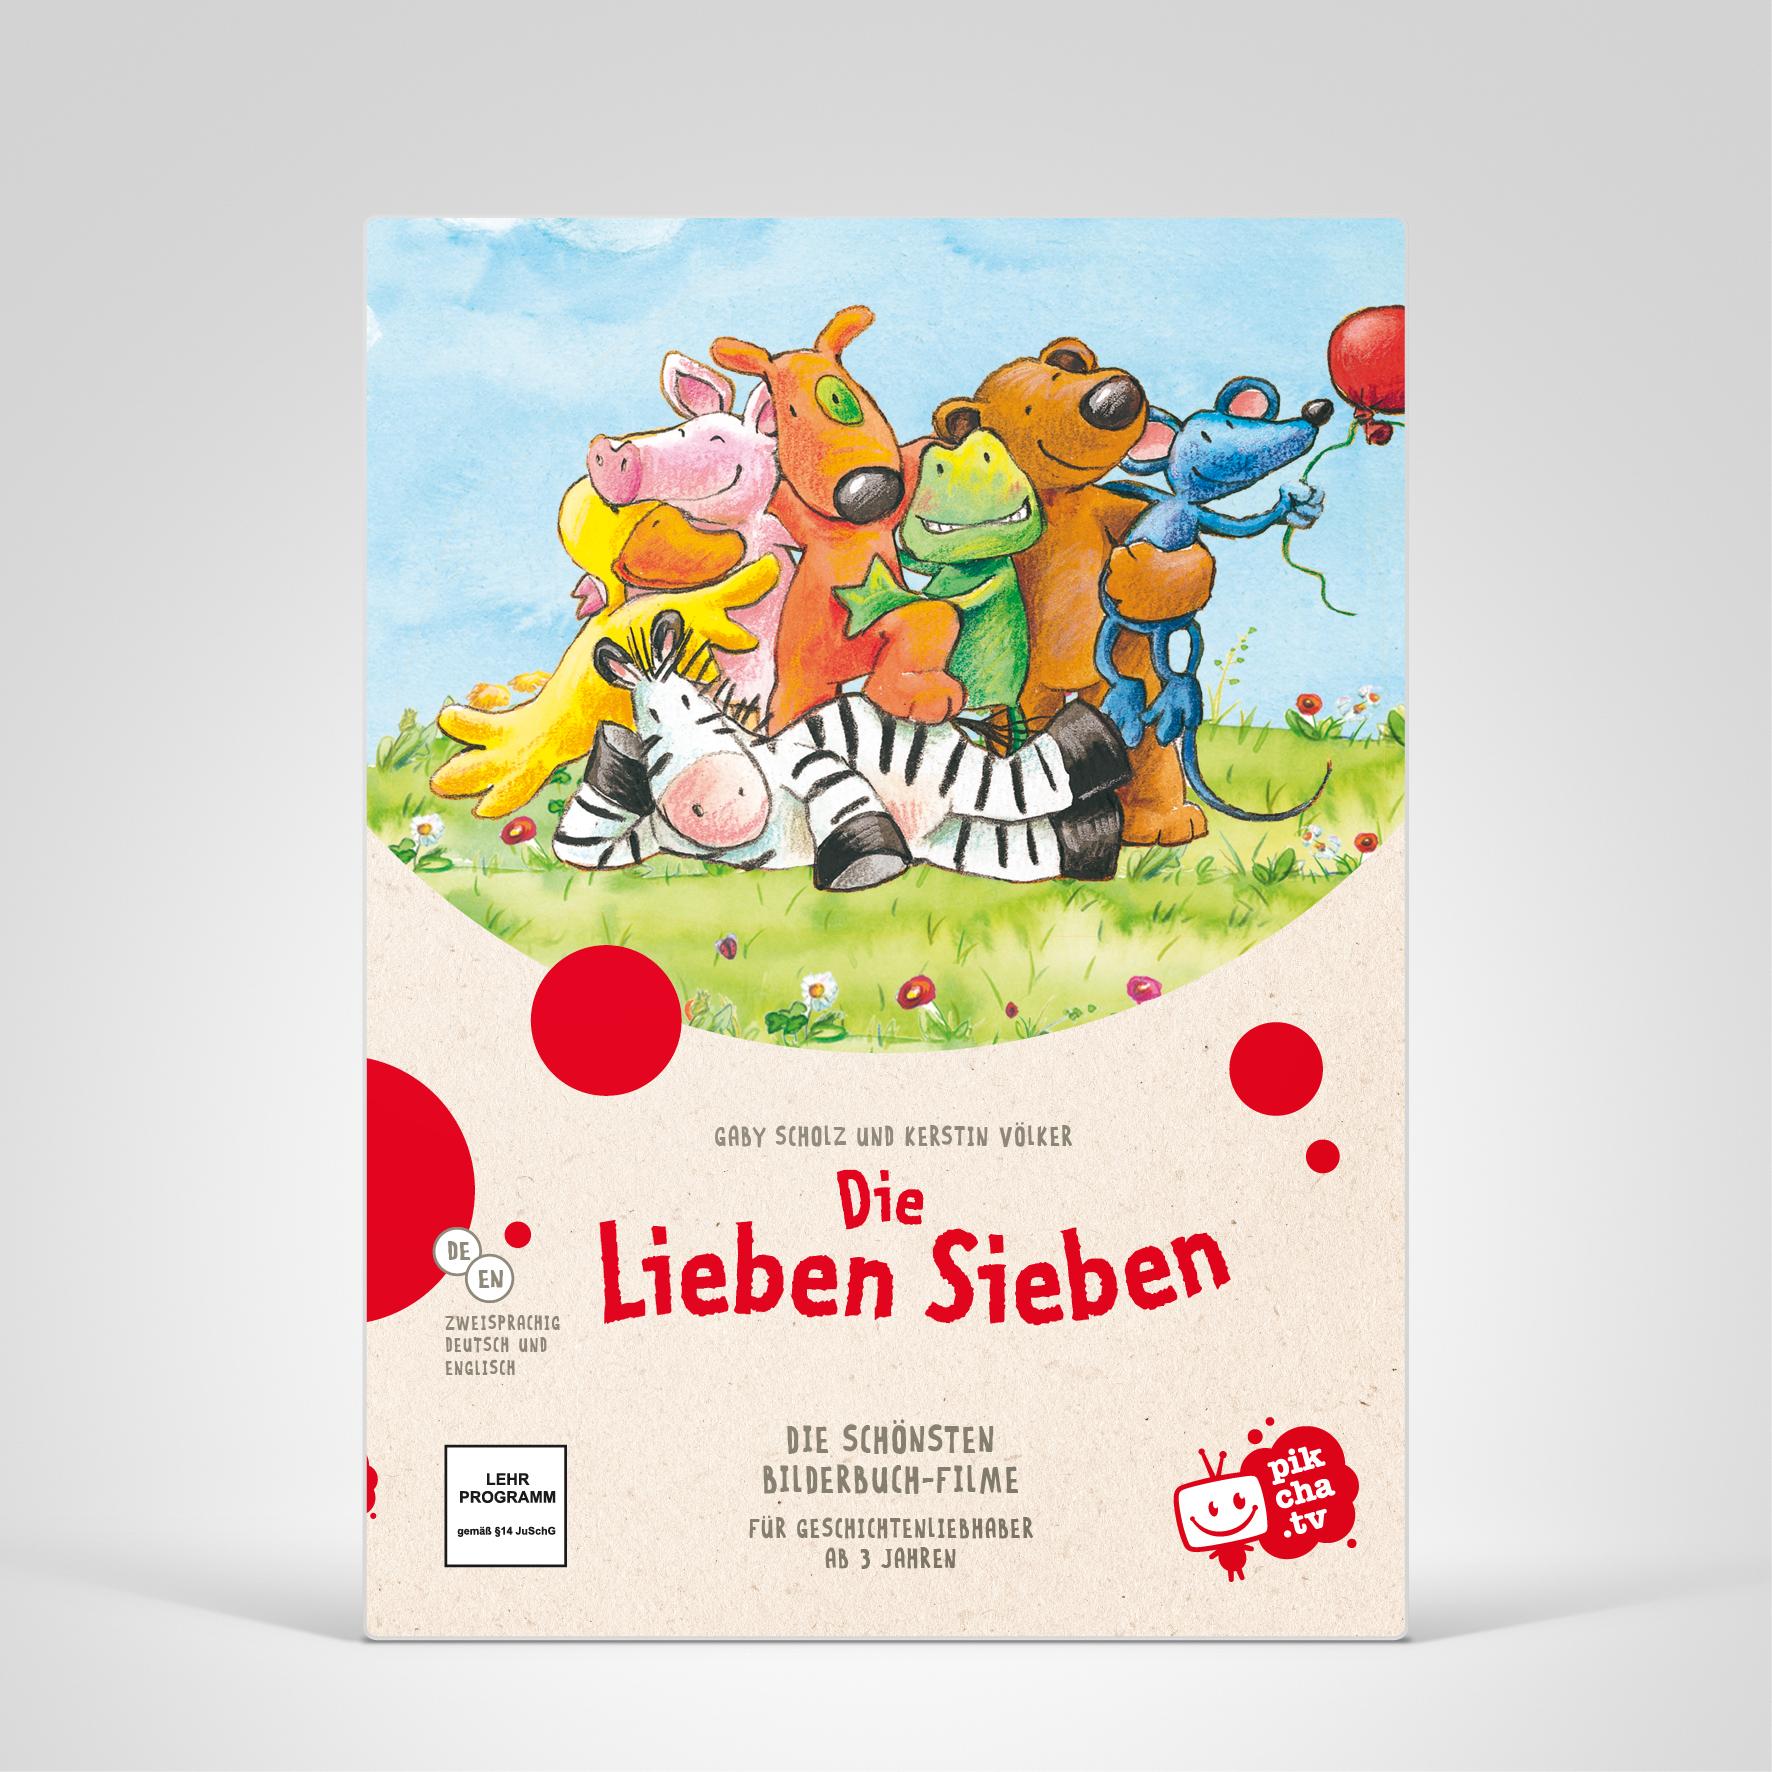 Pikcha.TV, Lieben Sieben, Cover-Abbildung